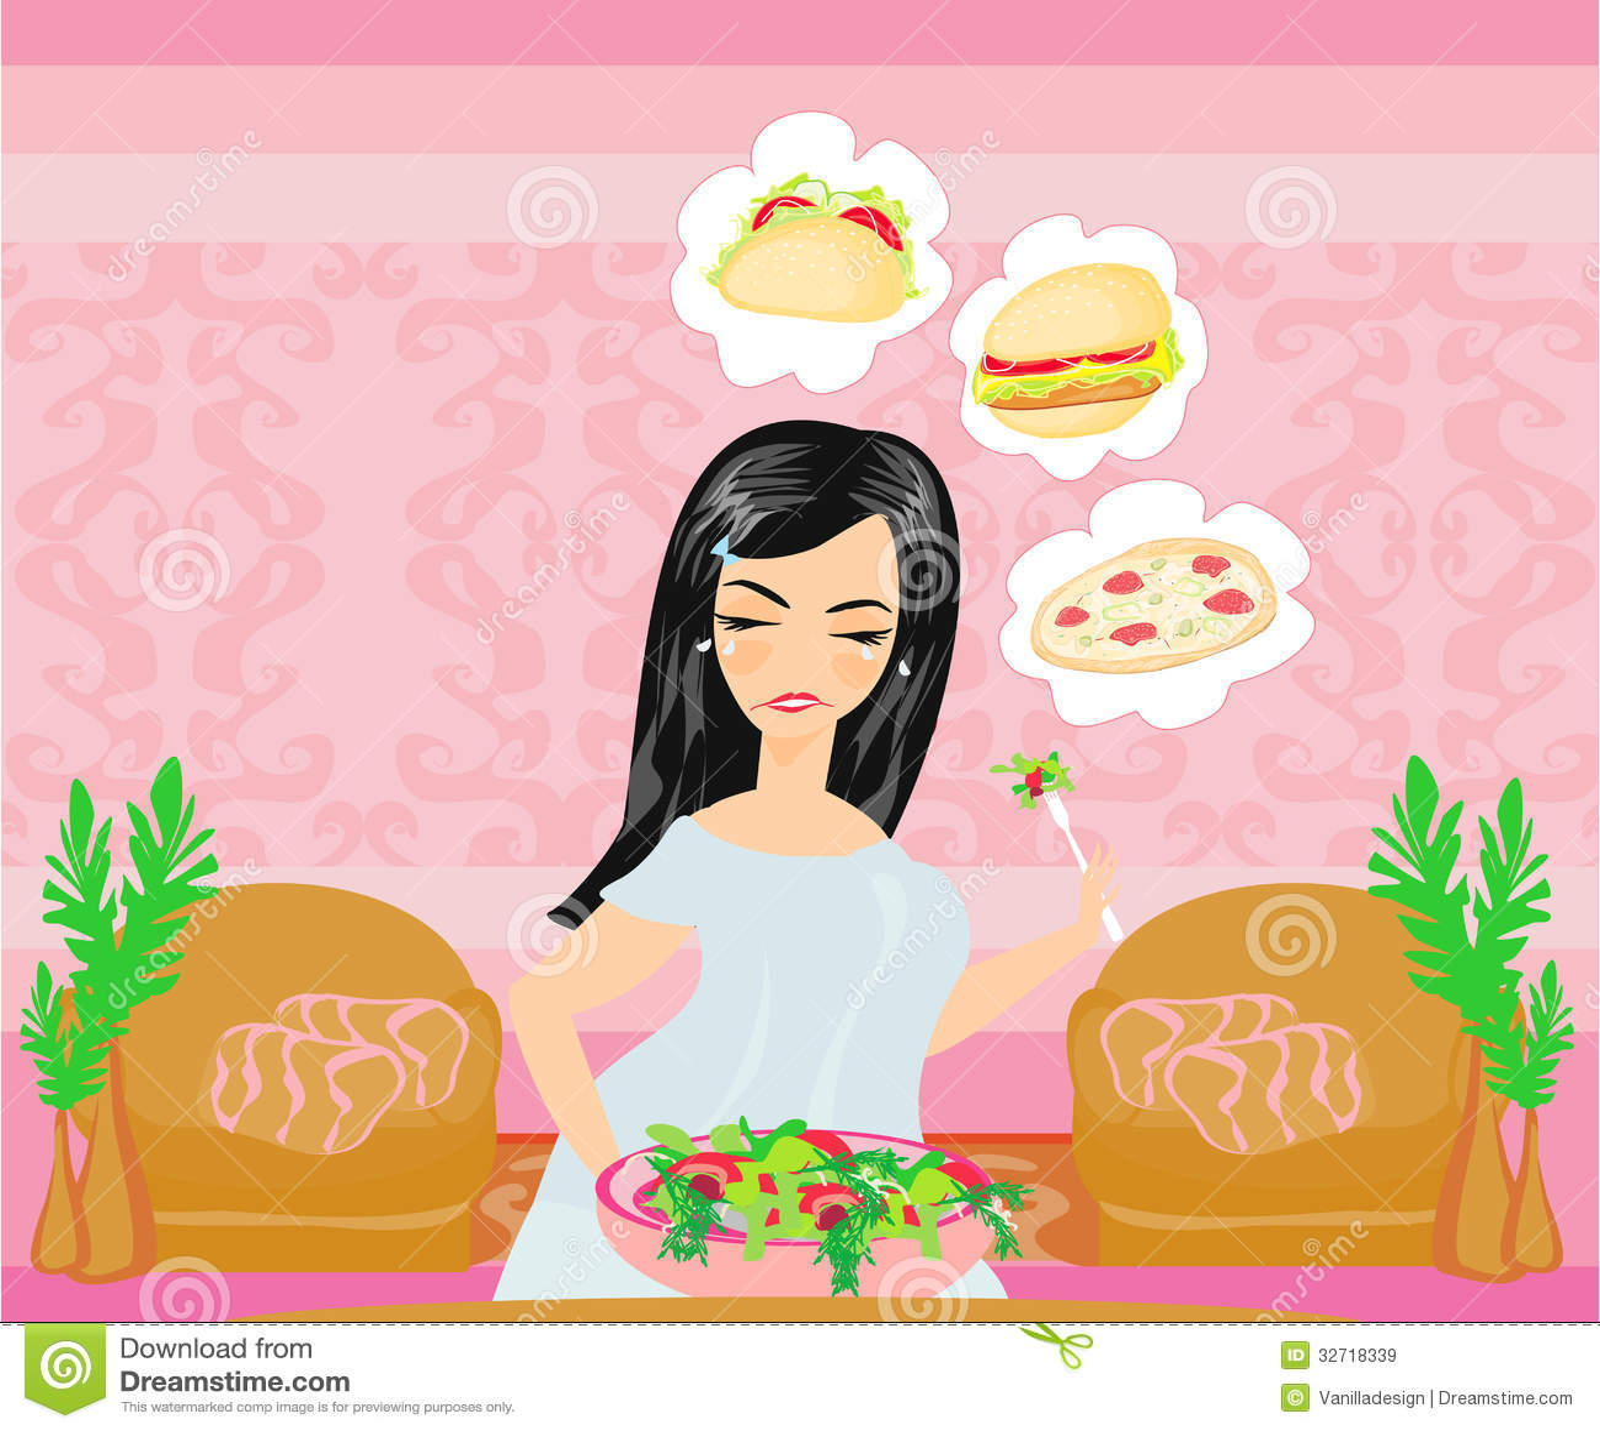 What dreams of food 25